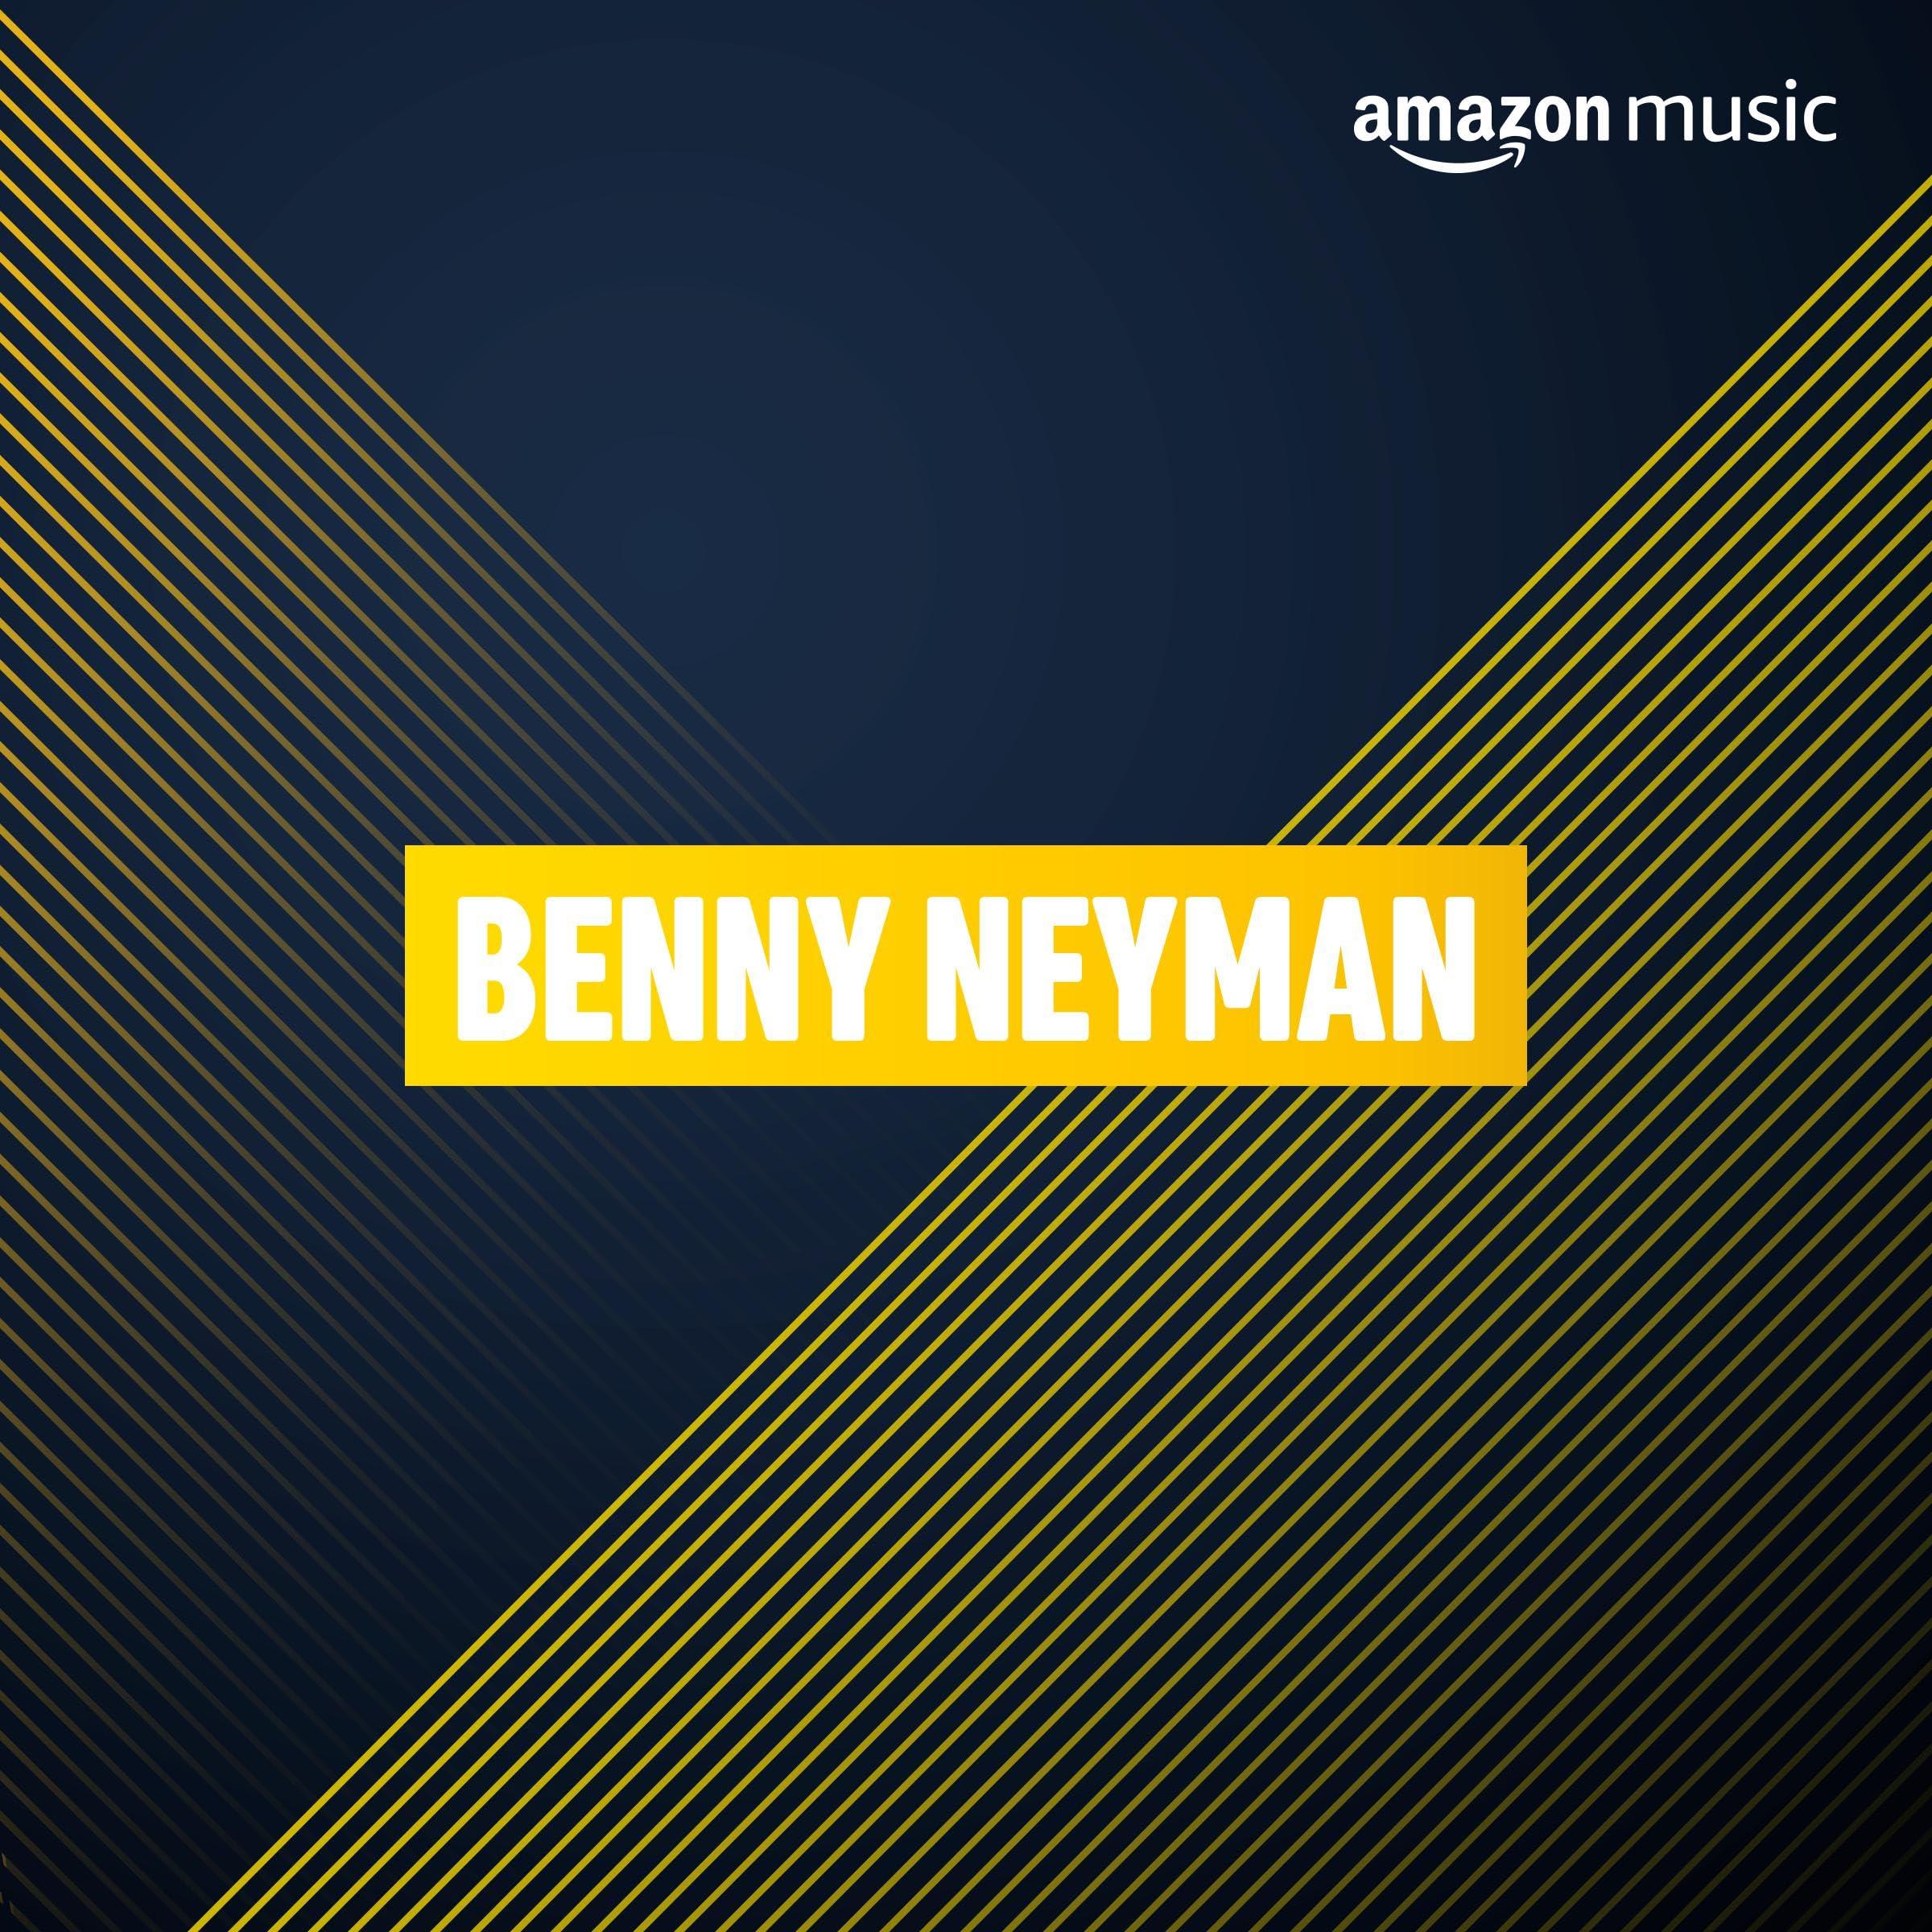 Benny Neyman